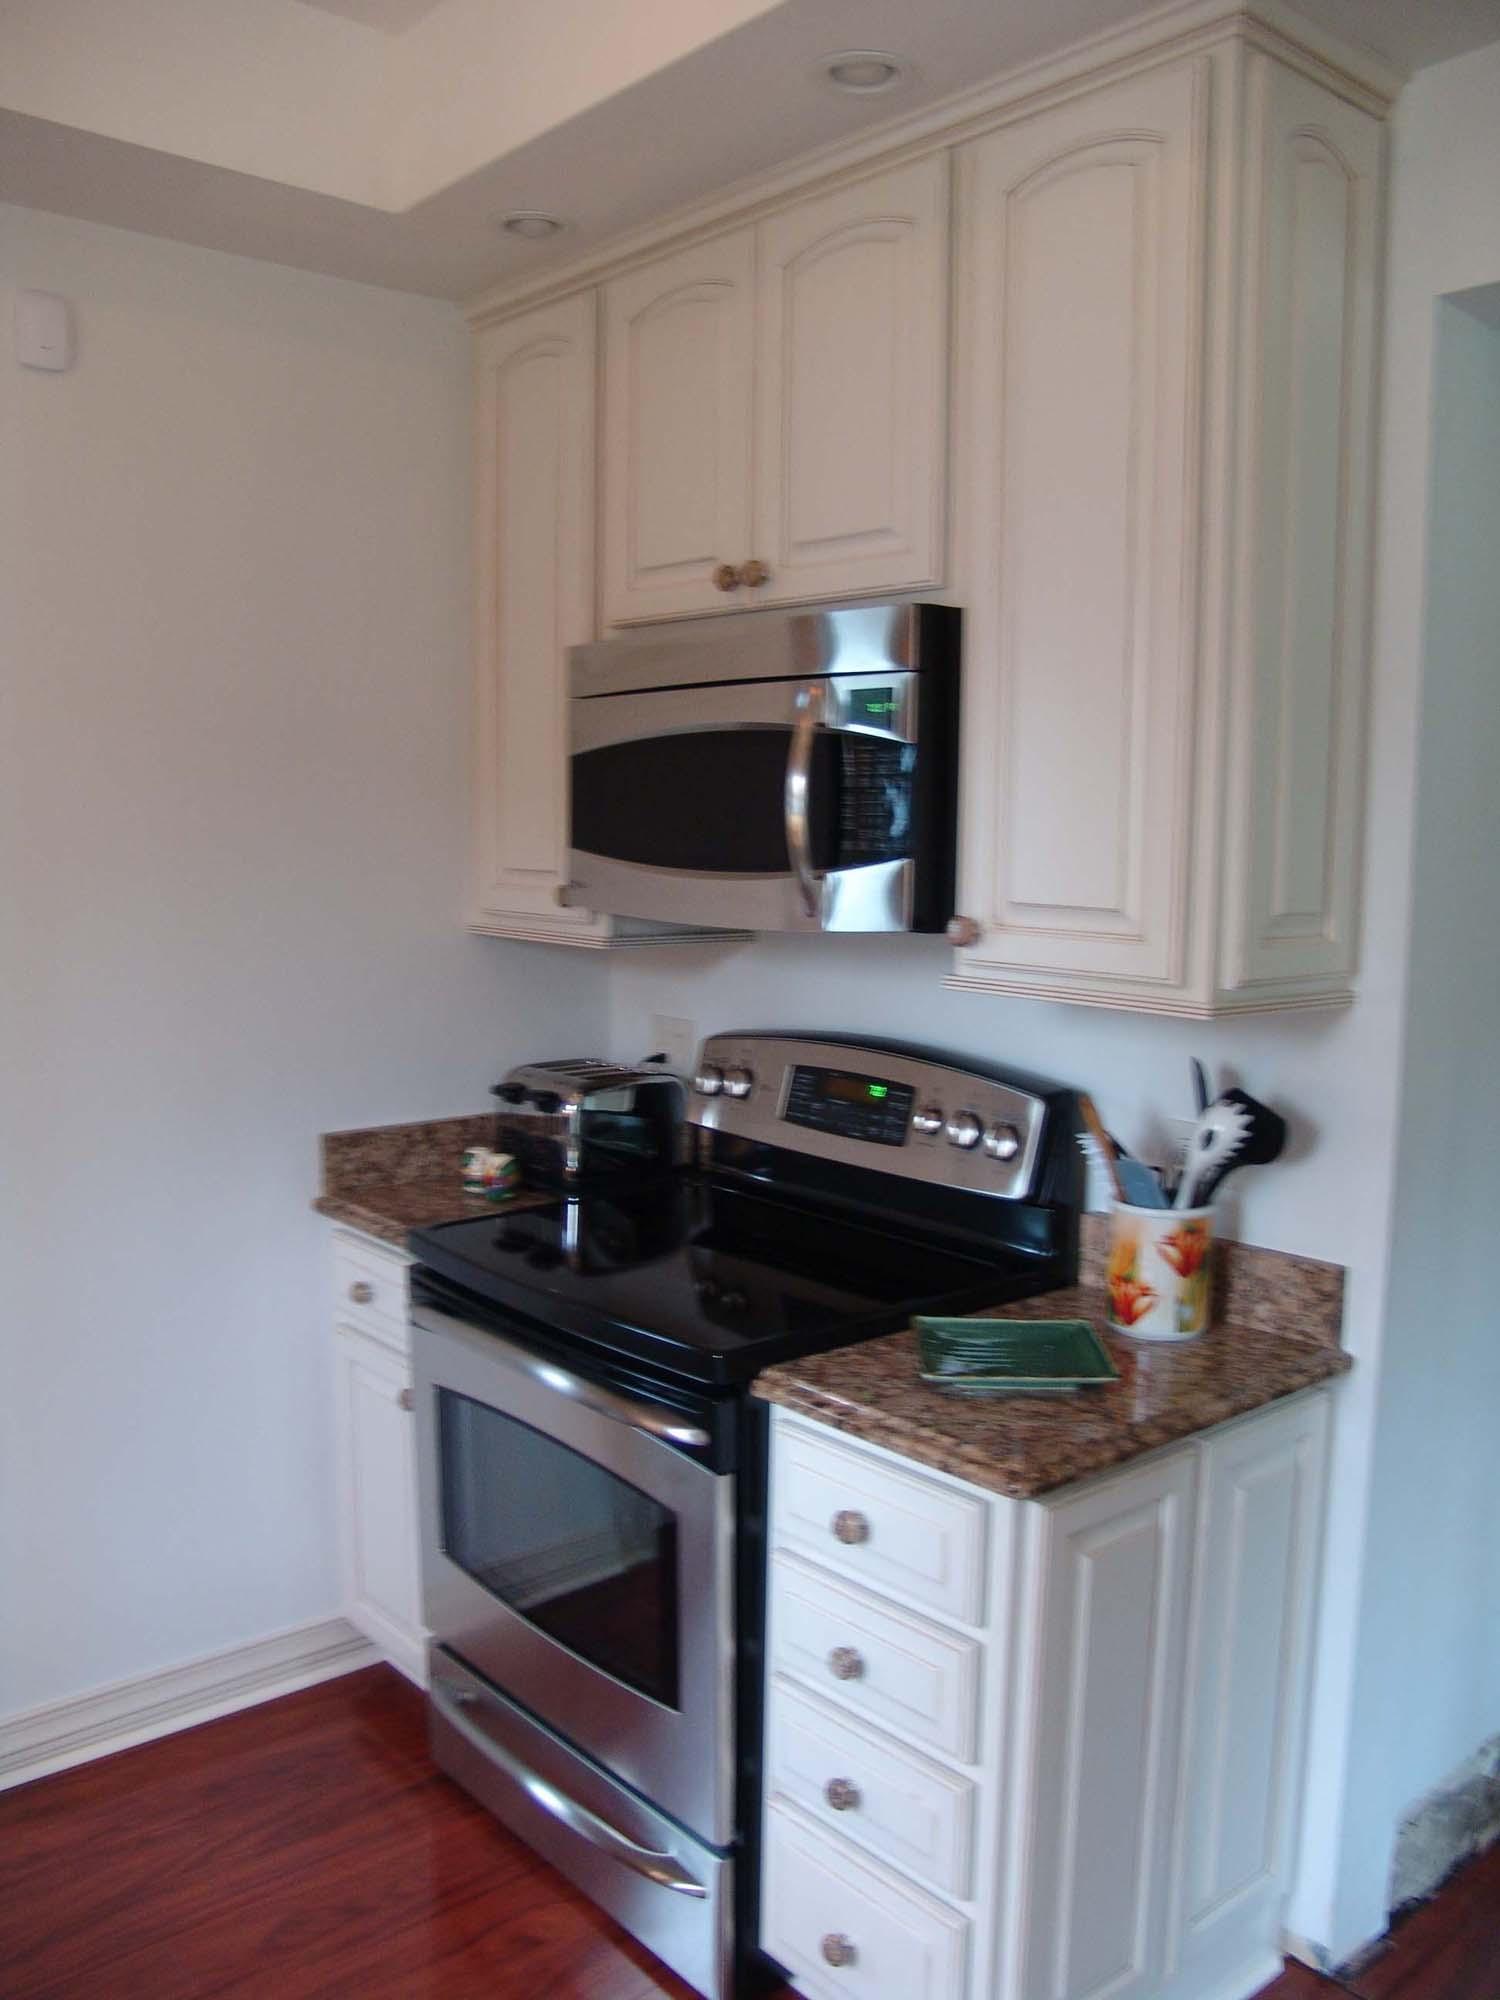 Home Depot Or Manasota Flooring Cabinets Alva Real